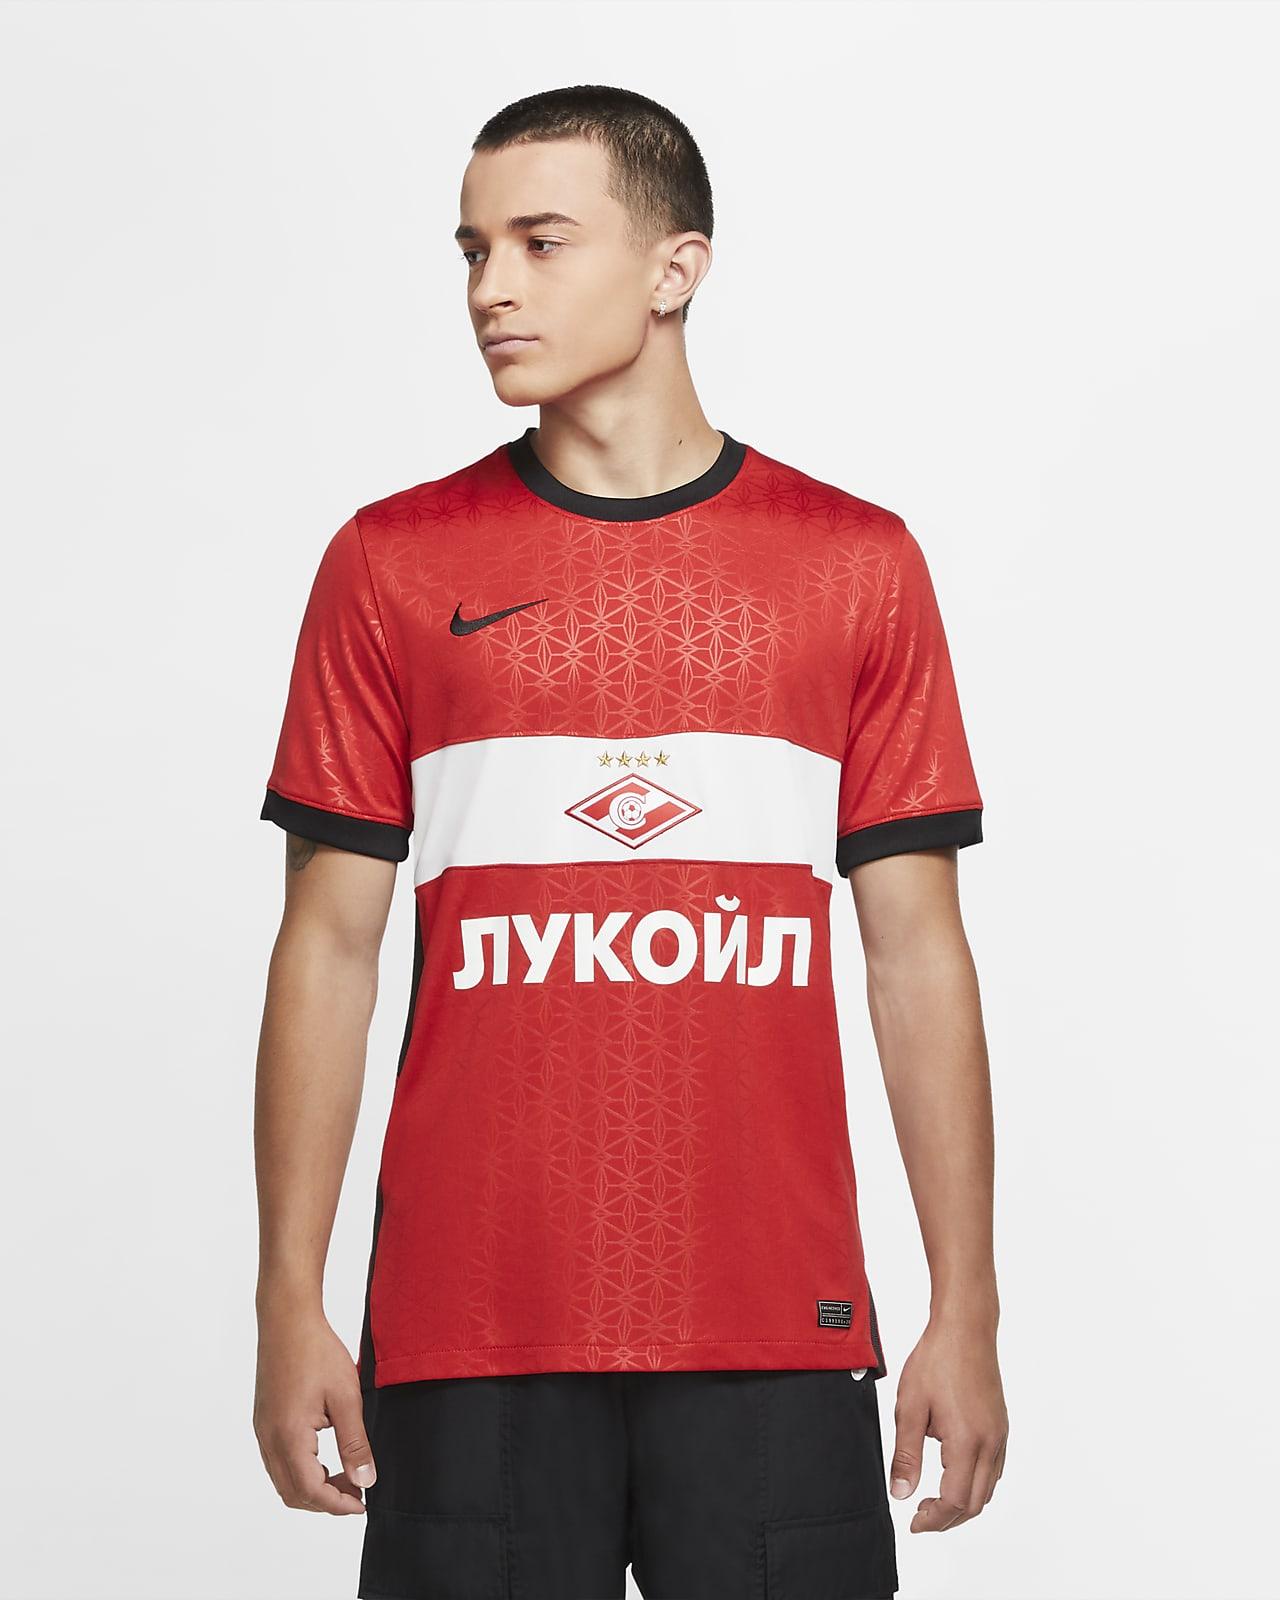 Spartak Moscow 2020/21 Stadyum İç Saha Erkek Futbol Forması